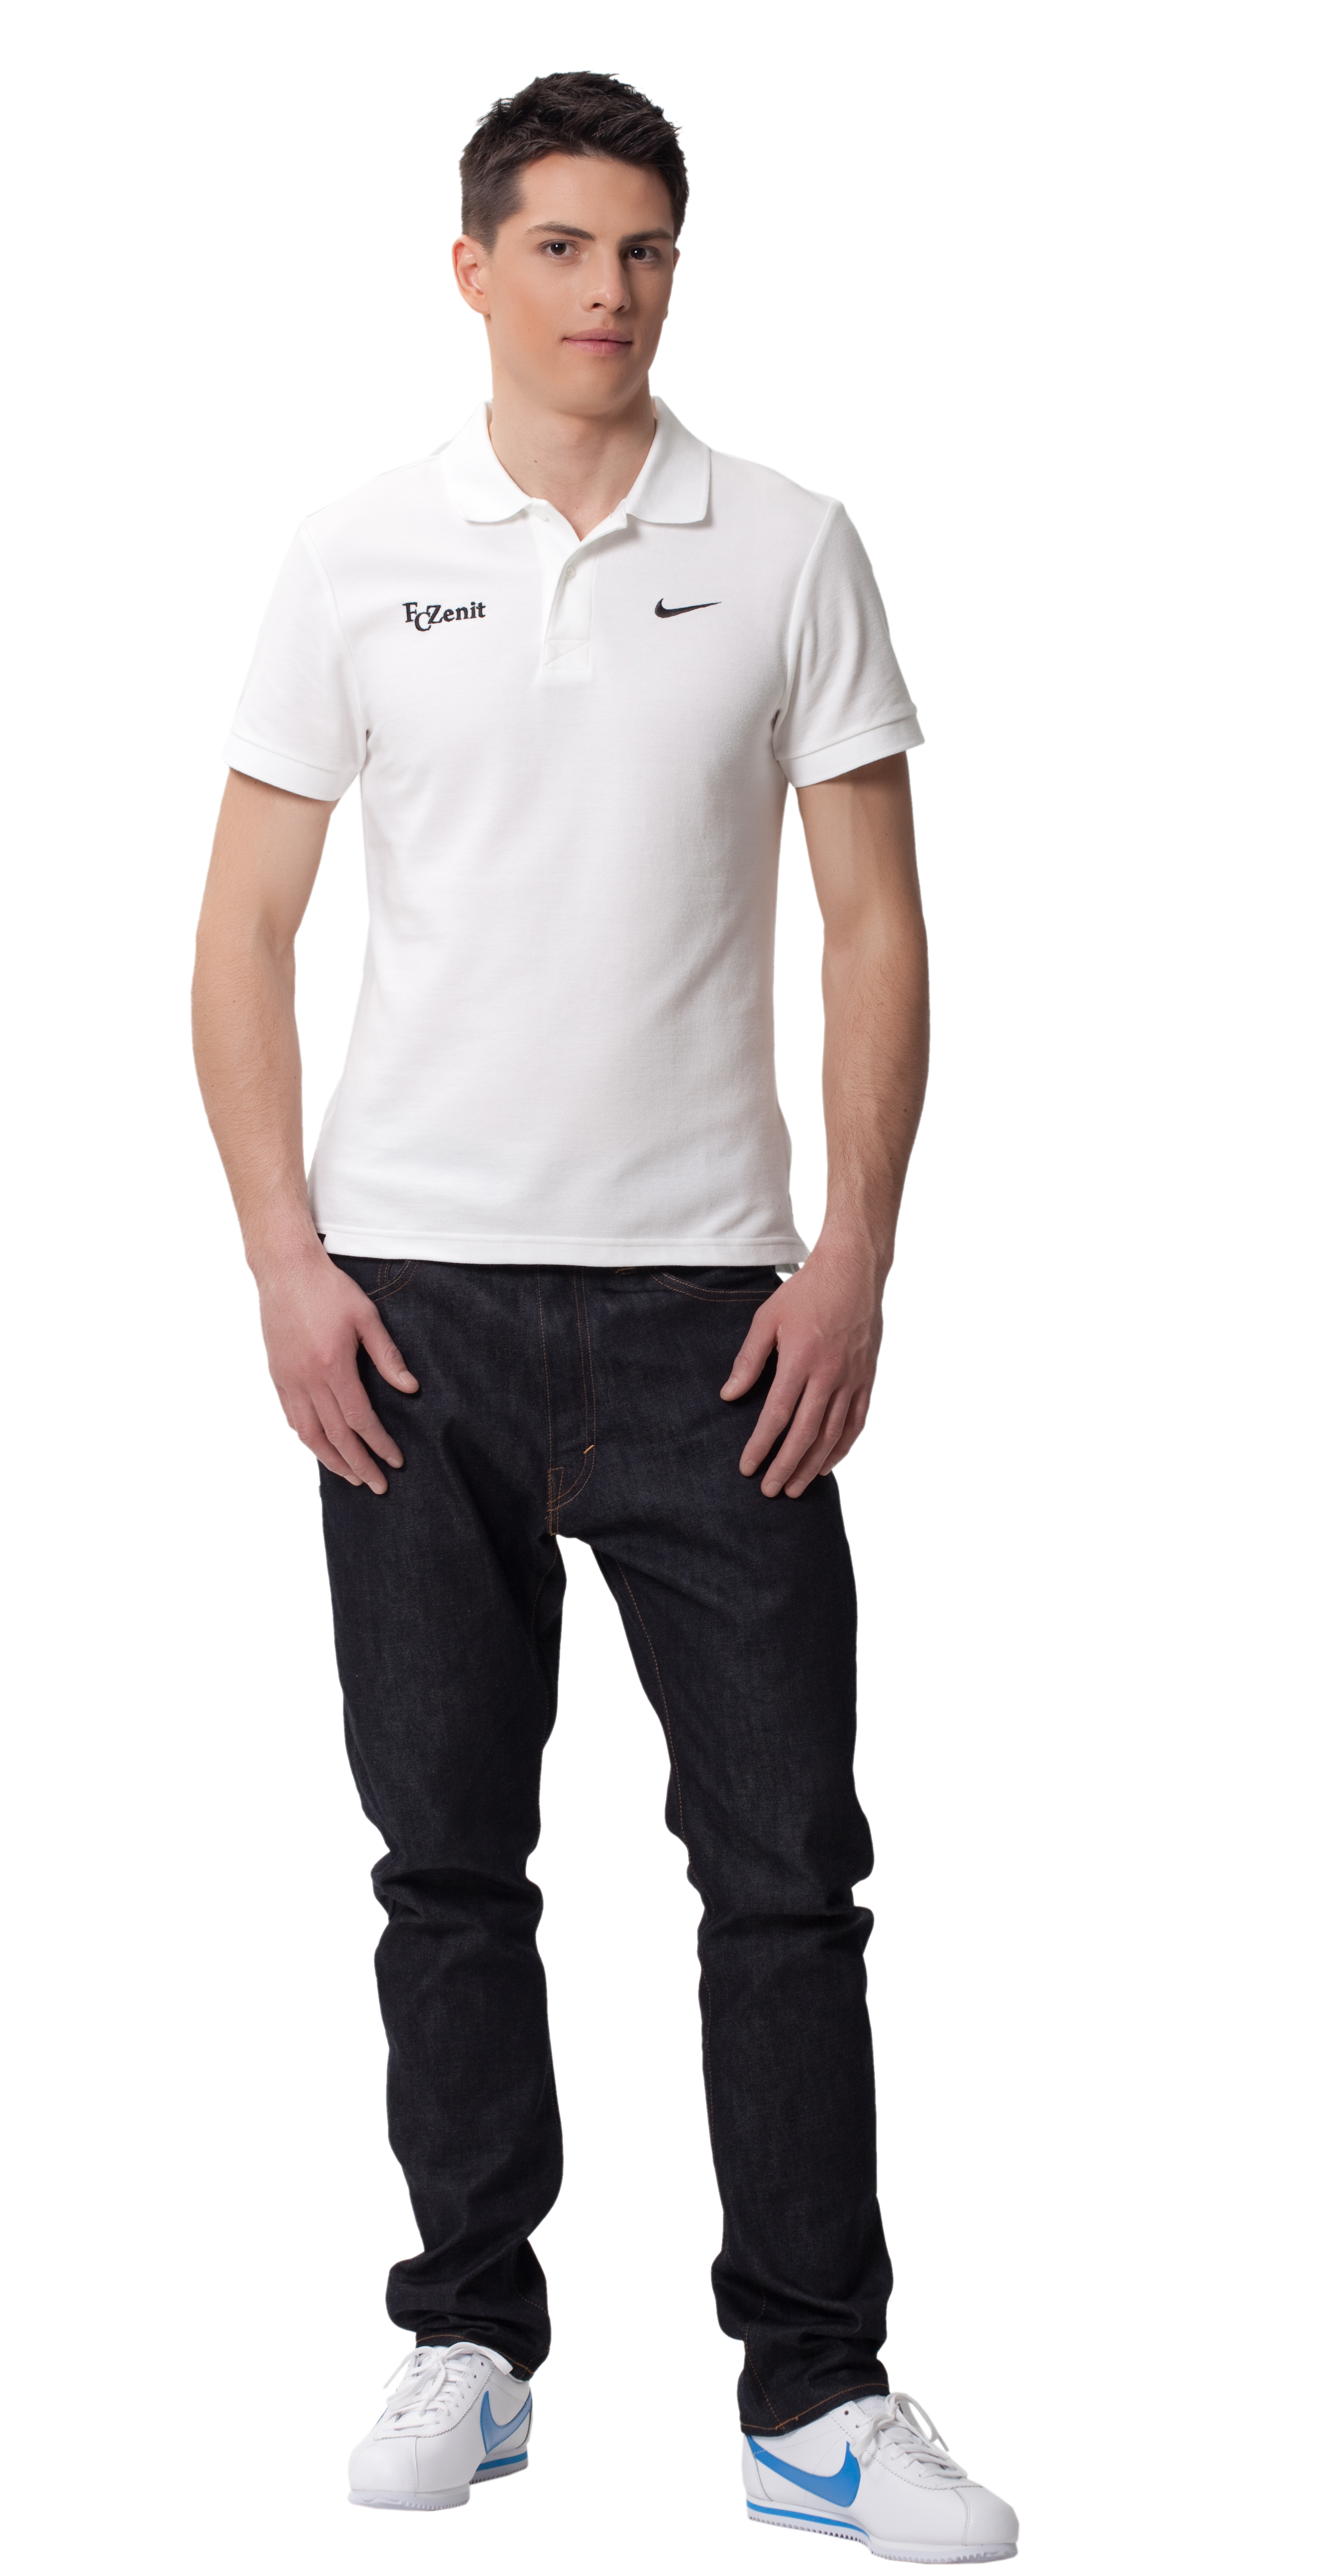 Поло мужское Nike, белый, Цвет-Белый, Размер-XL